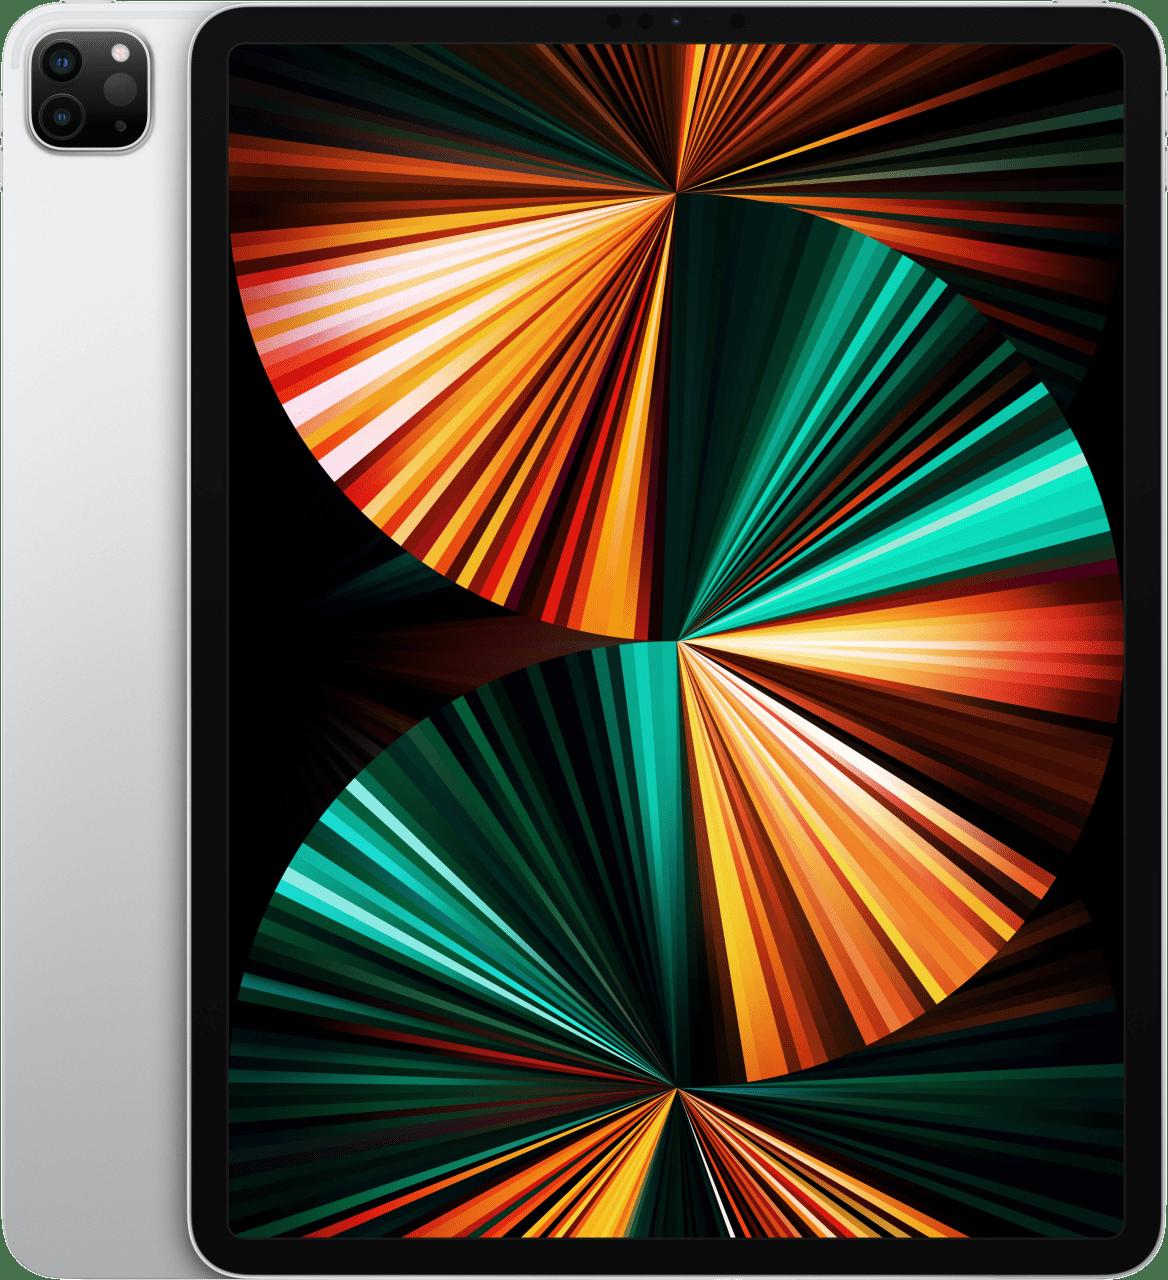 Silber Apple 12,9 Zoll iPad Pro WiFi + 5G 2TB (2021).1